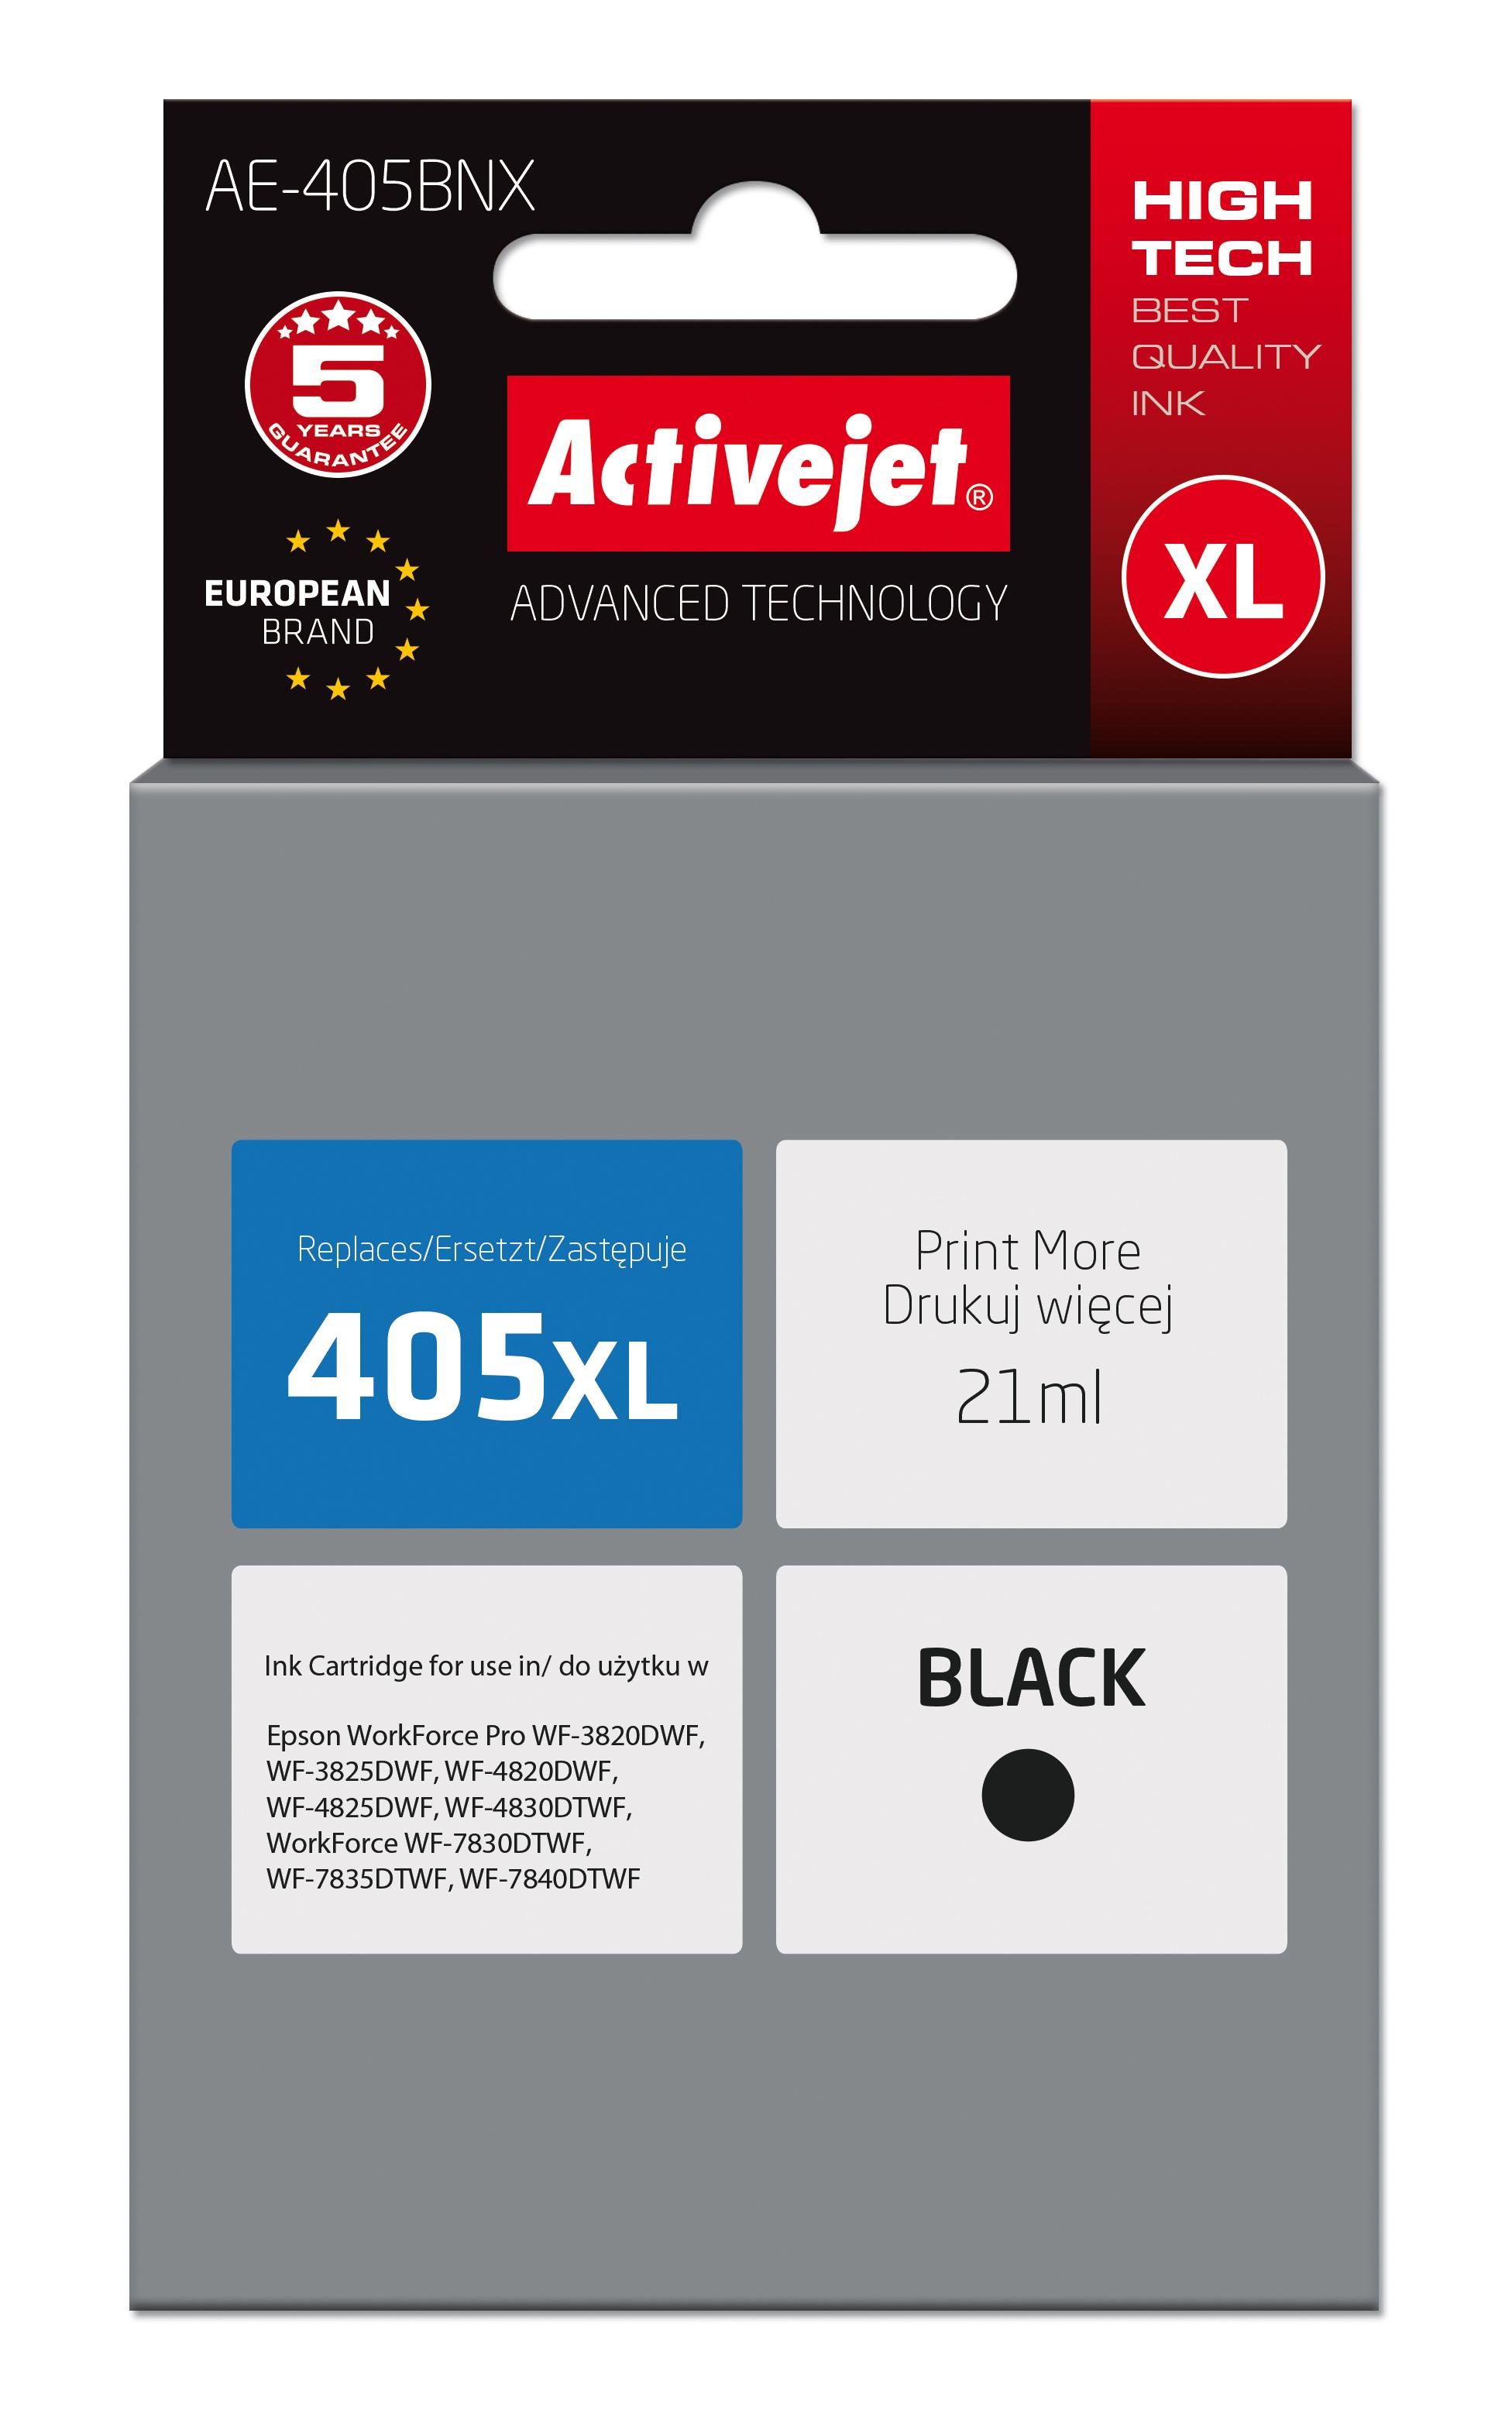 Tusz Activejet AE-405BNX do drukarki Epson, Zamiennik Epson 405XL C13T05H14010;  Supreme; 21 ml; czarny.